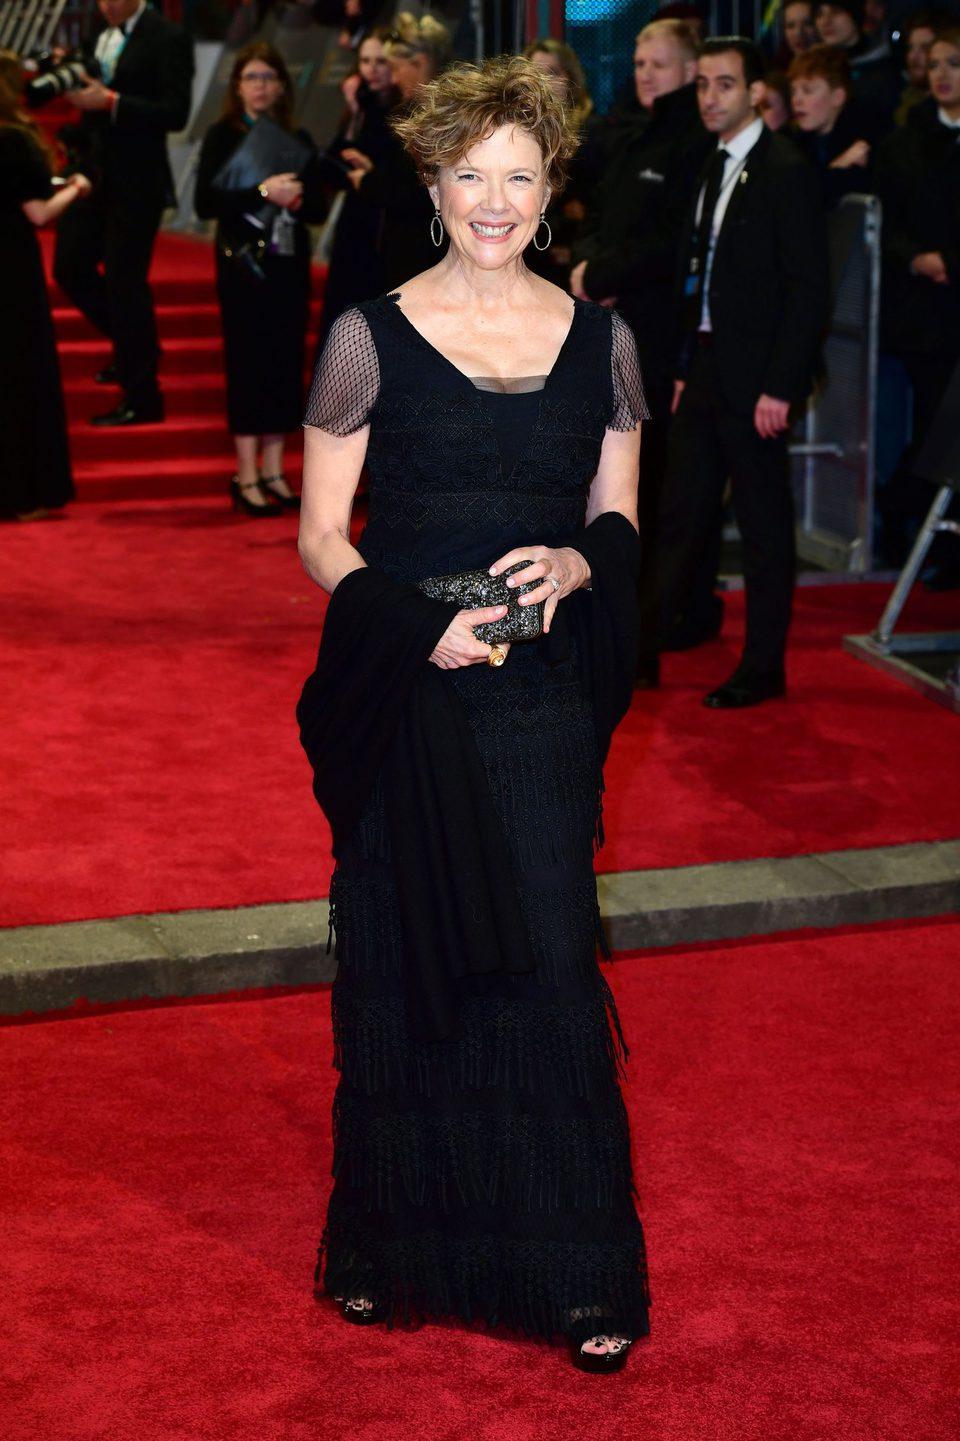 Annette Bening at the BAFTAs 2018 red carpet